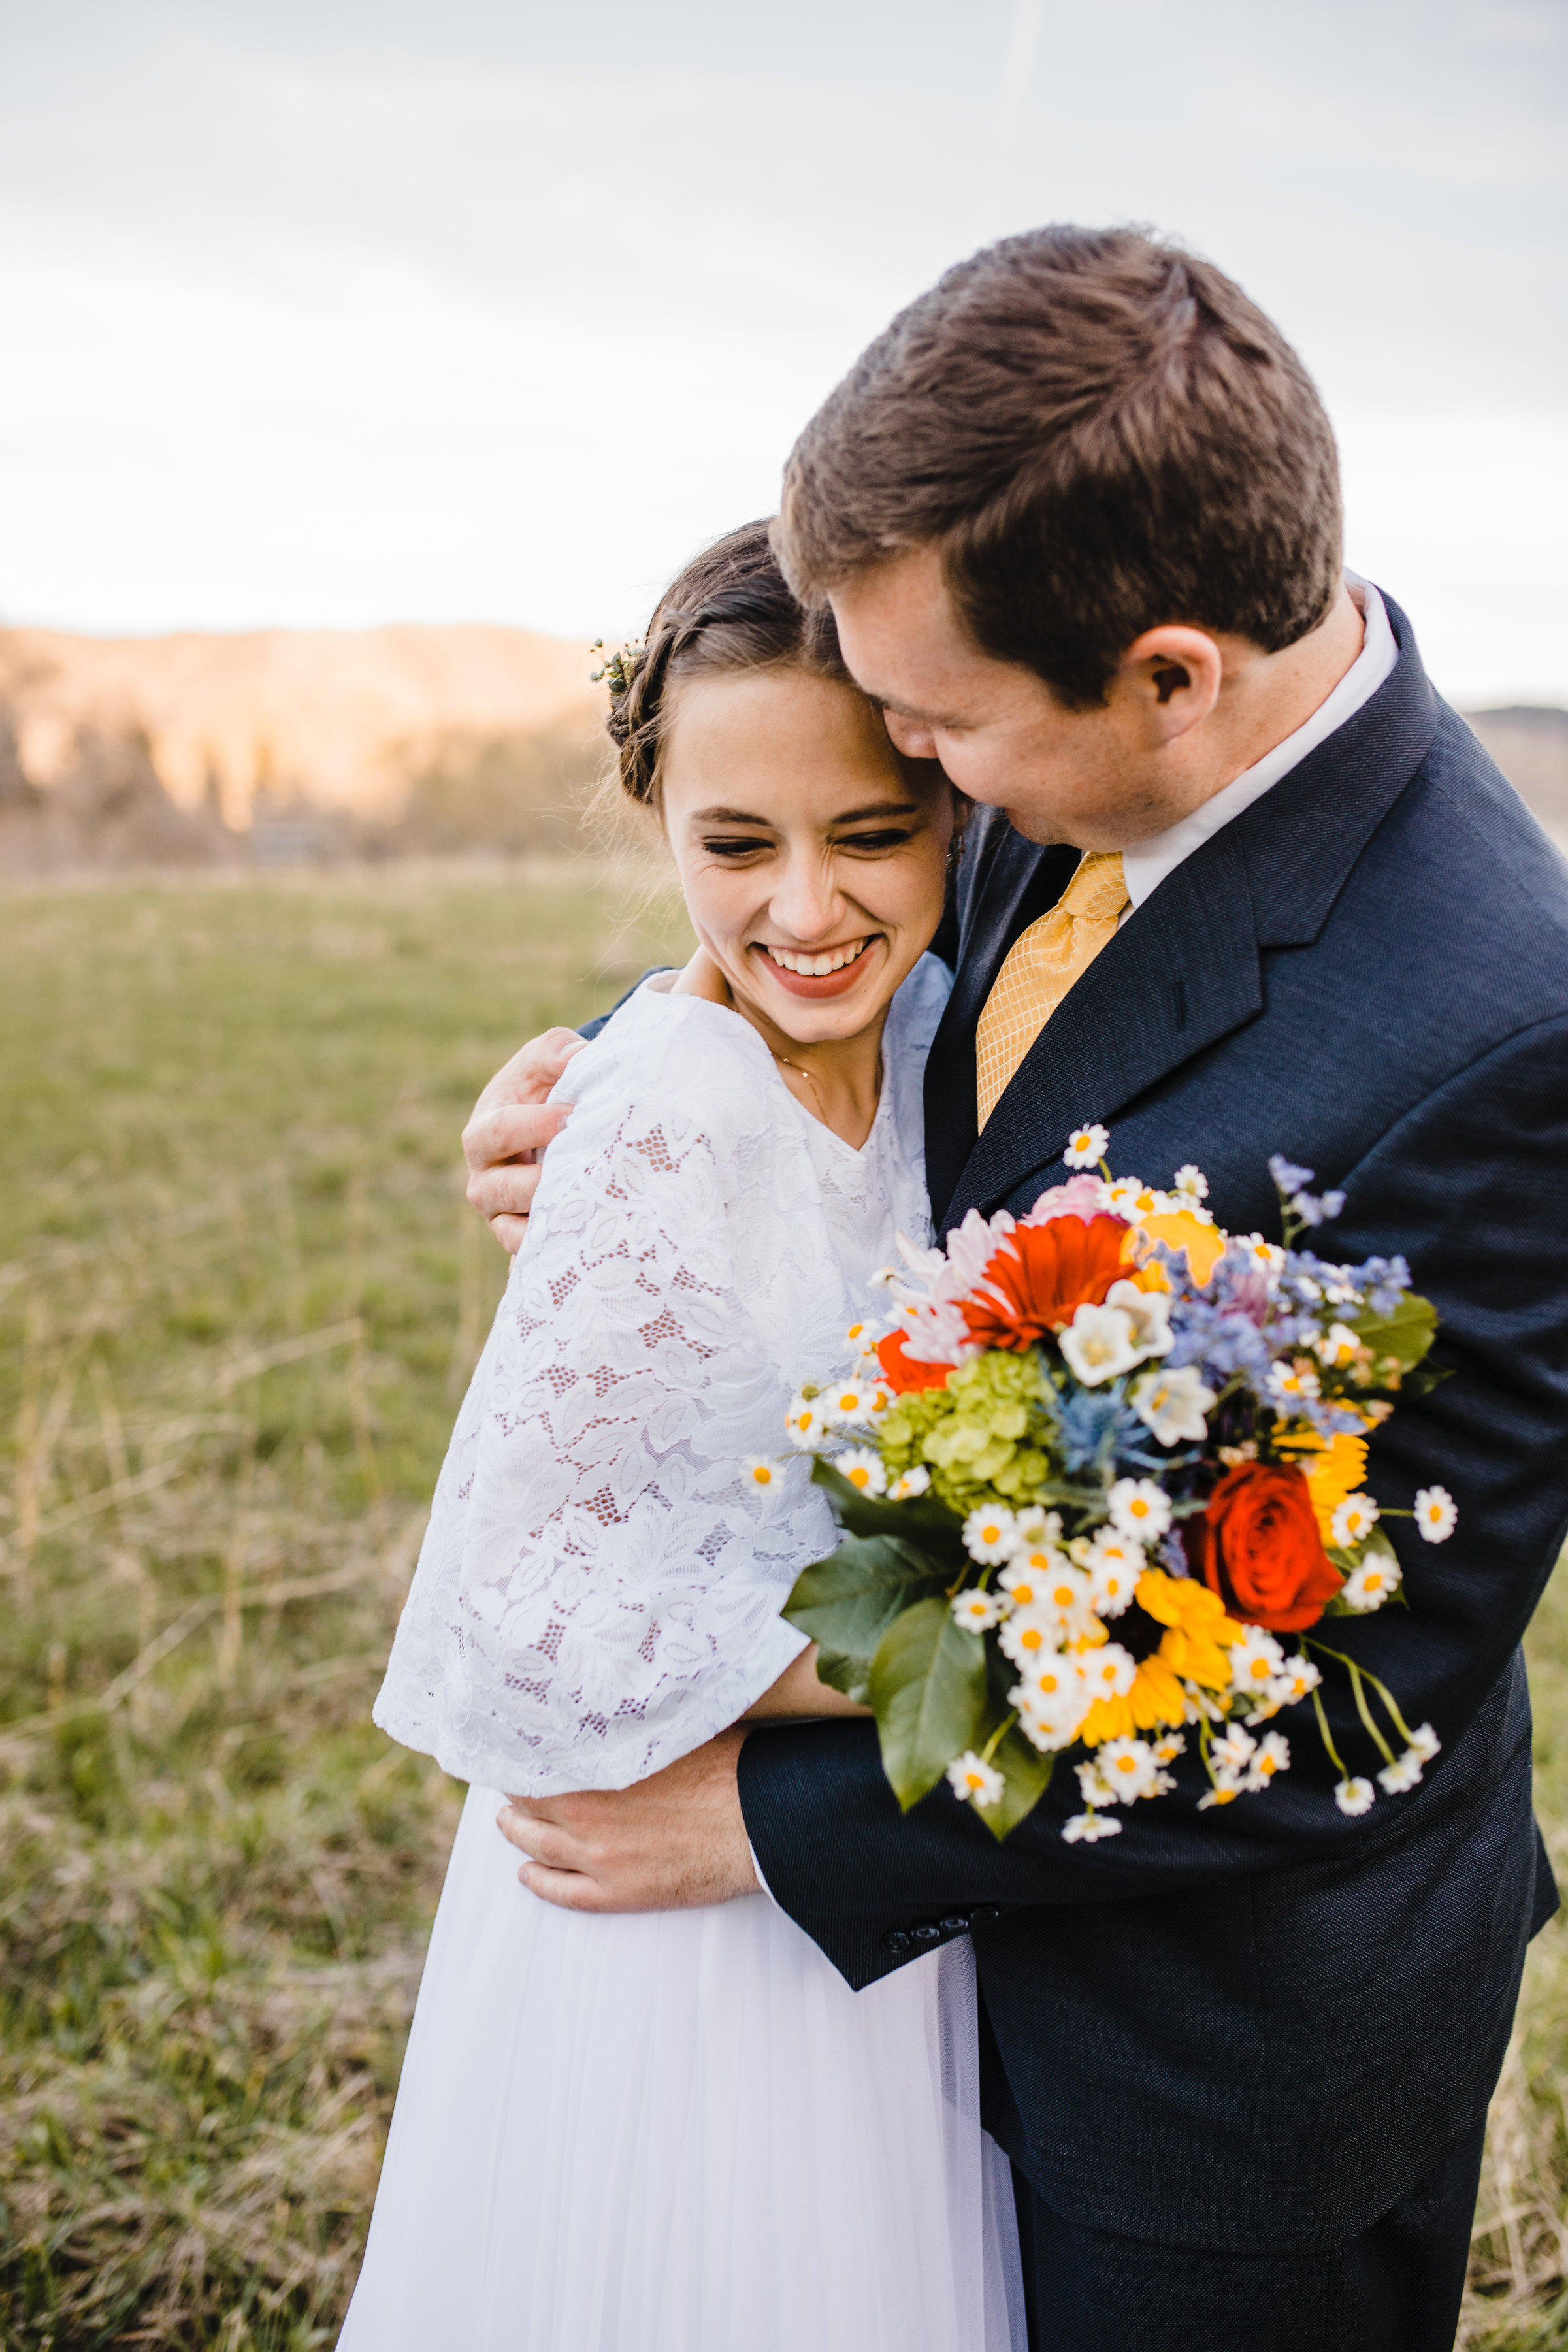 couples photography wedding day photo shoot calli richards arvada colorado wedding photographer